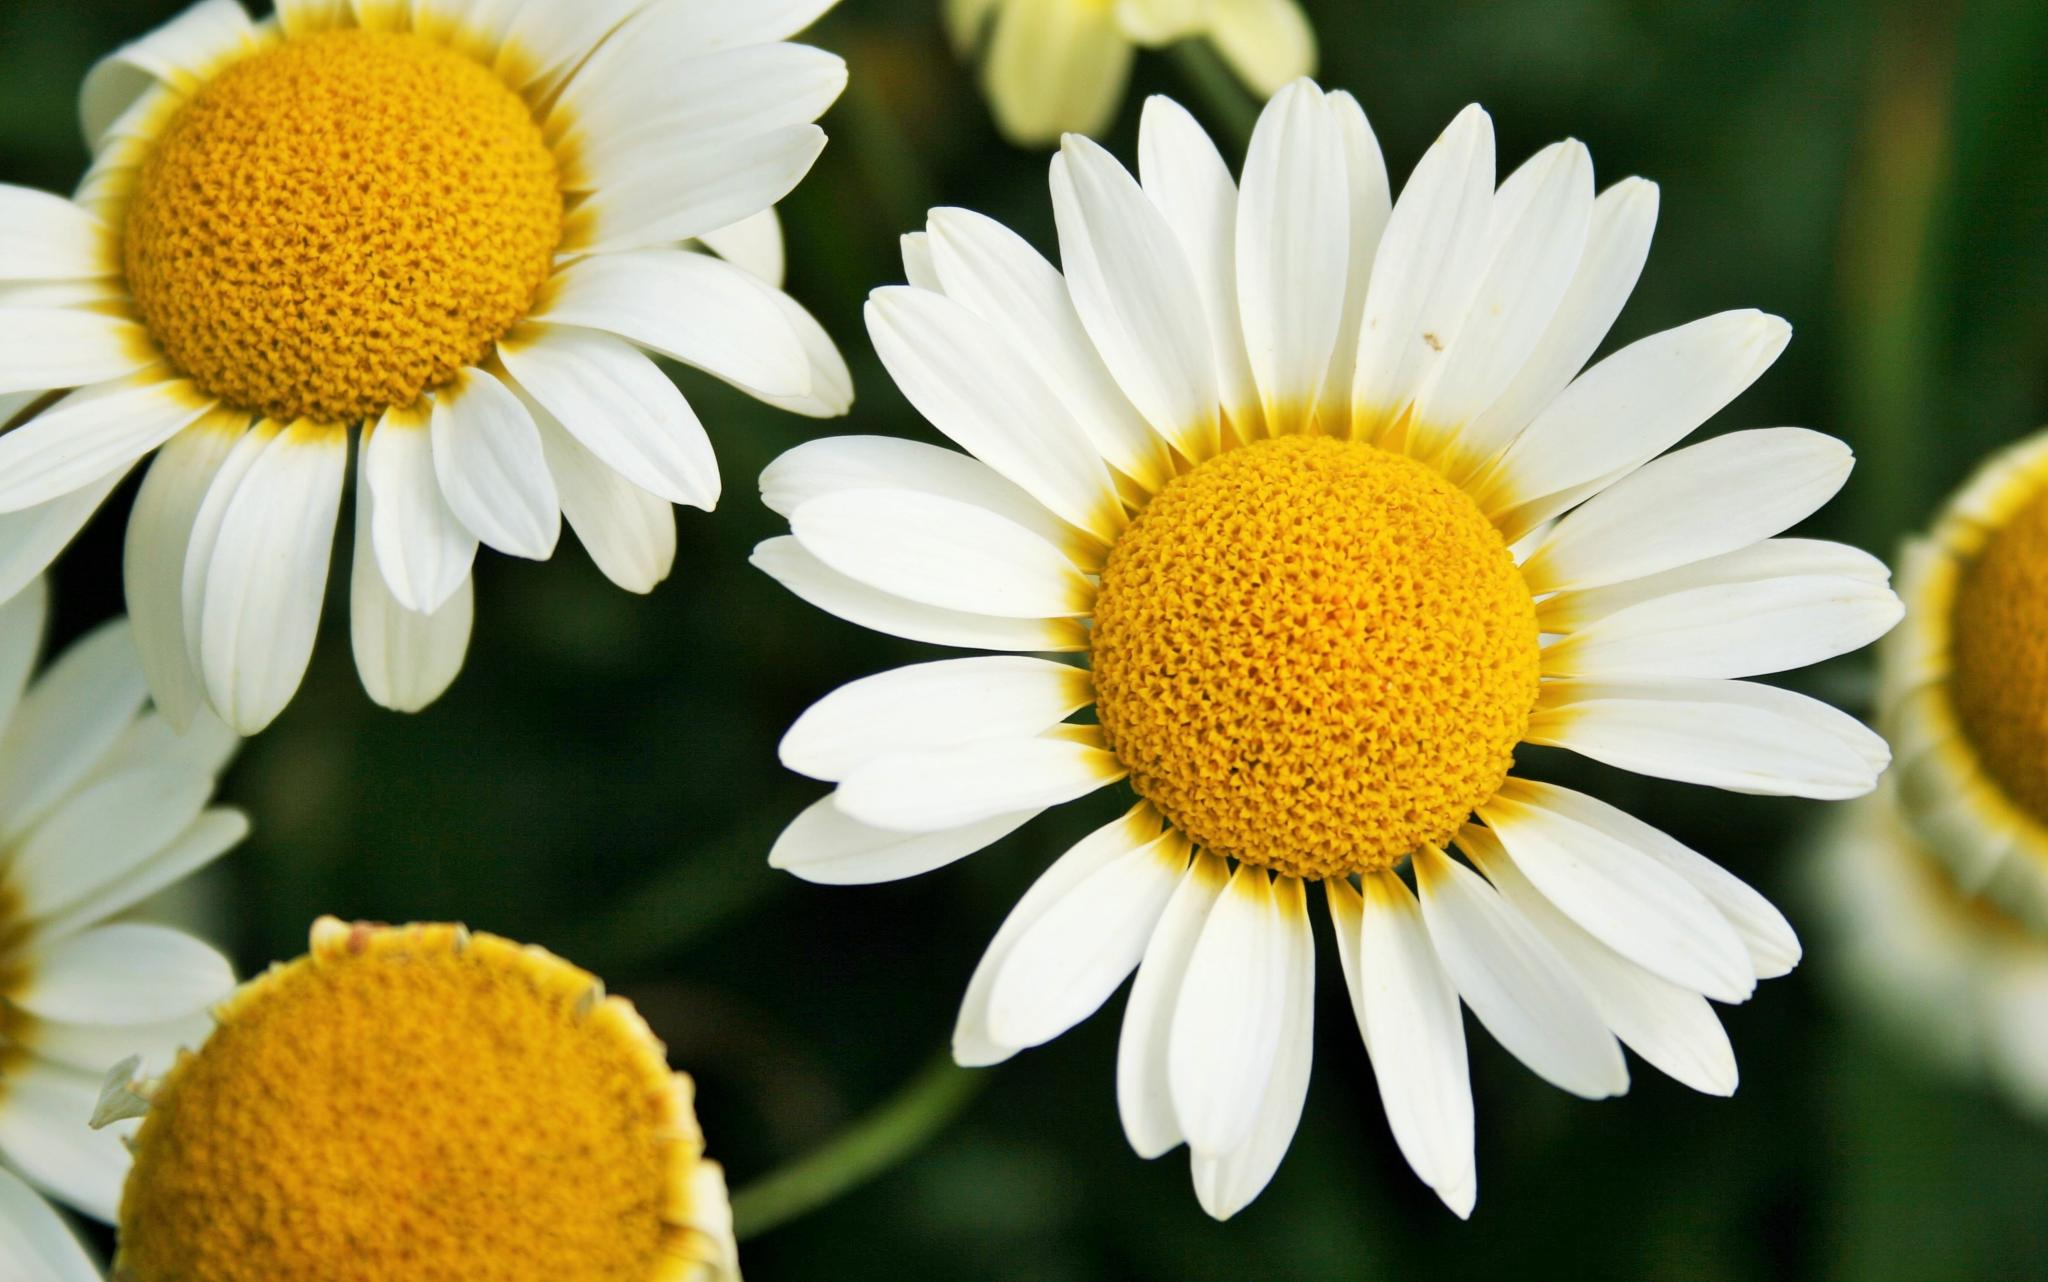 Daisy by Geoffrey Ackers